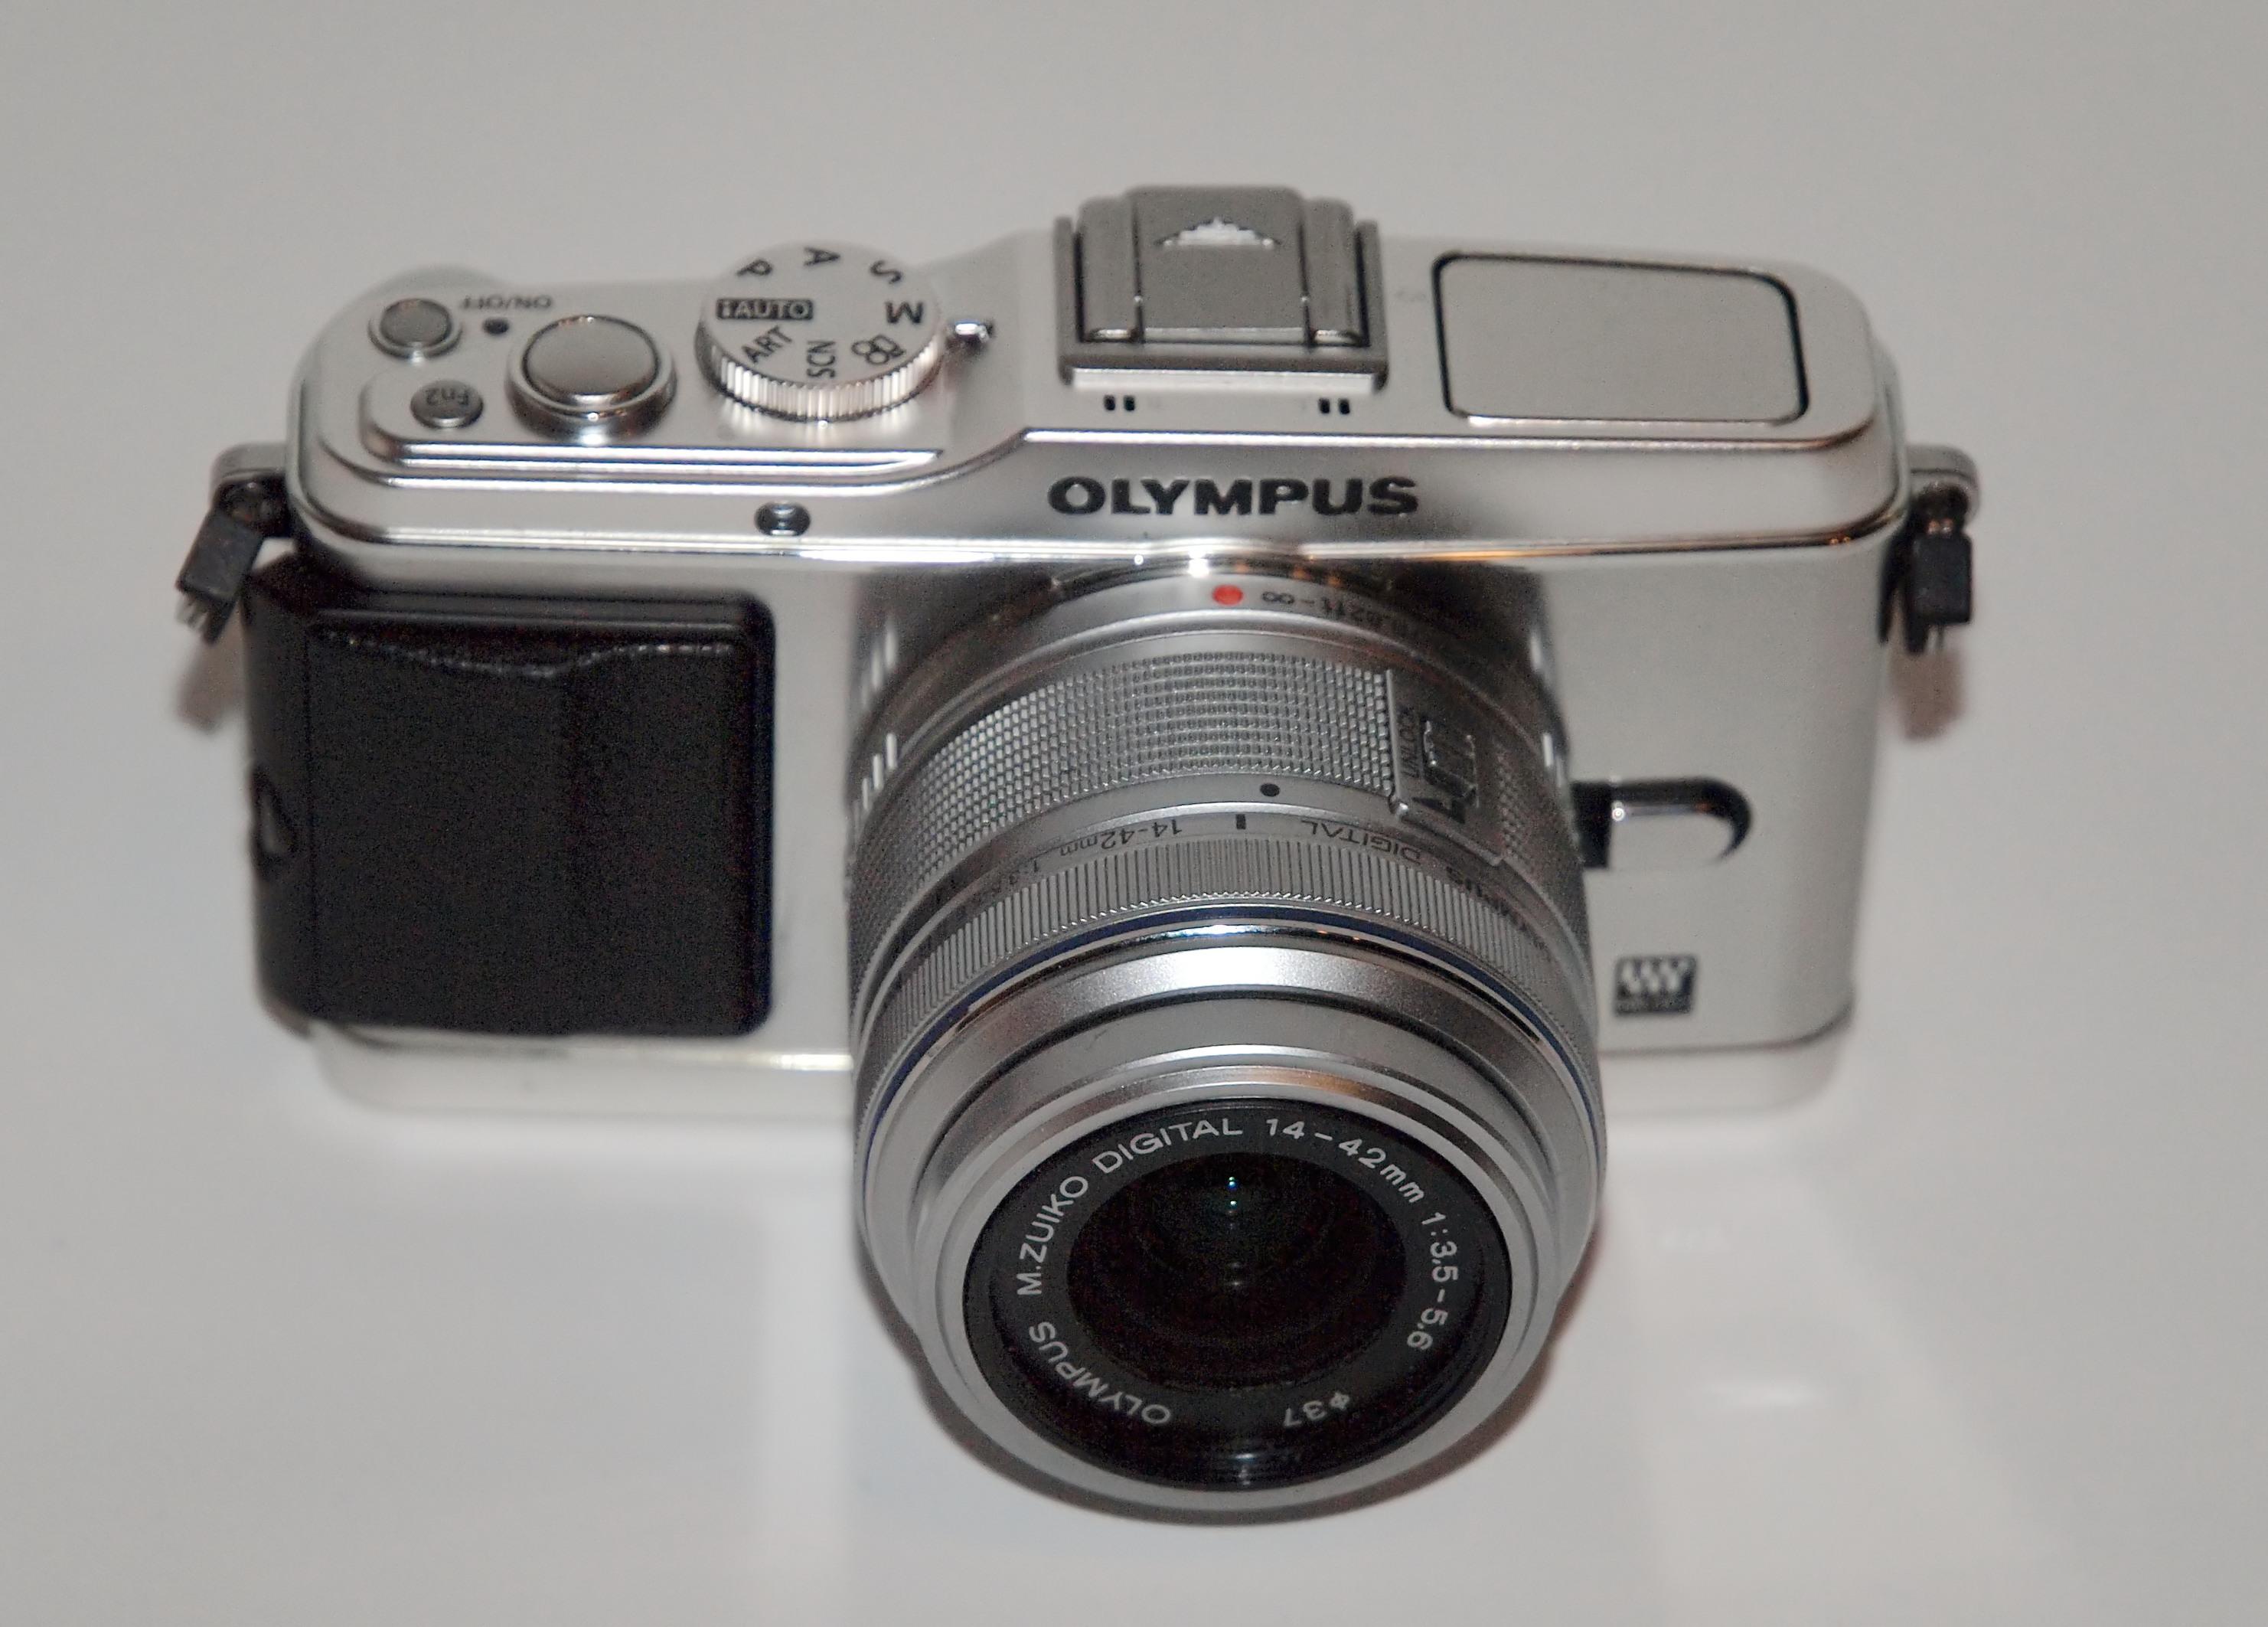 Olympus PEN E-P3 - Wikipedia